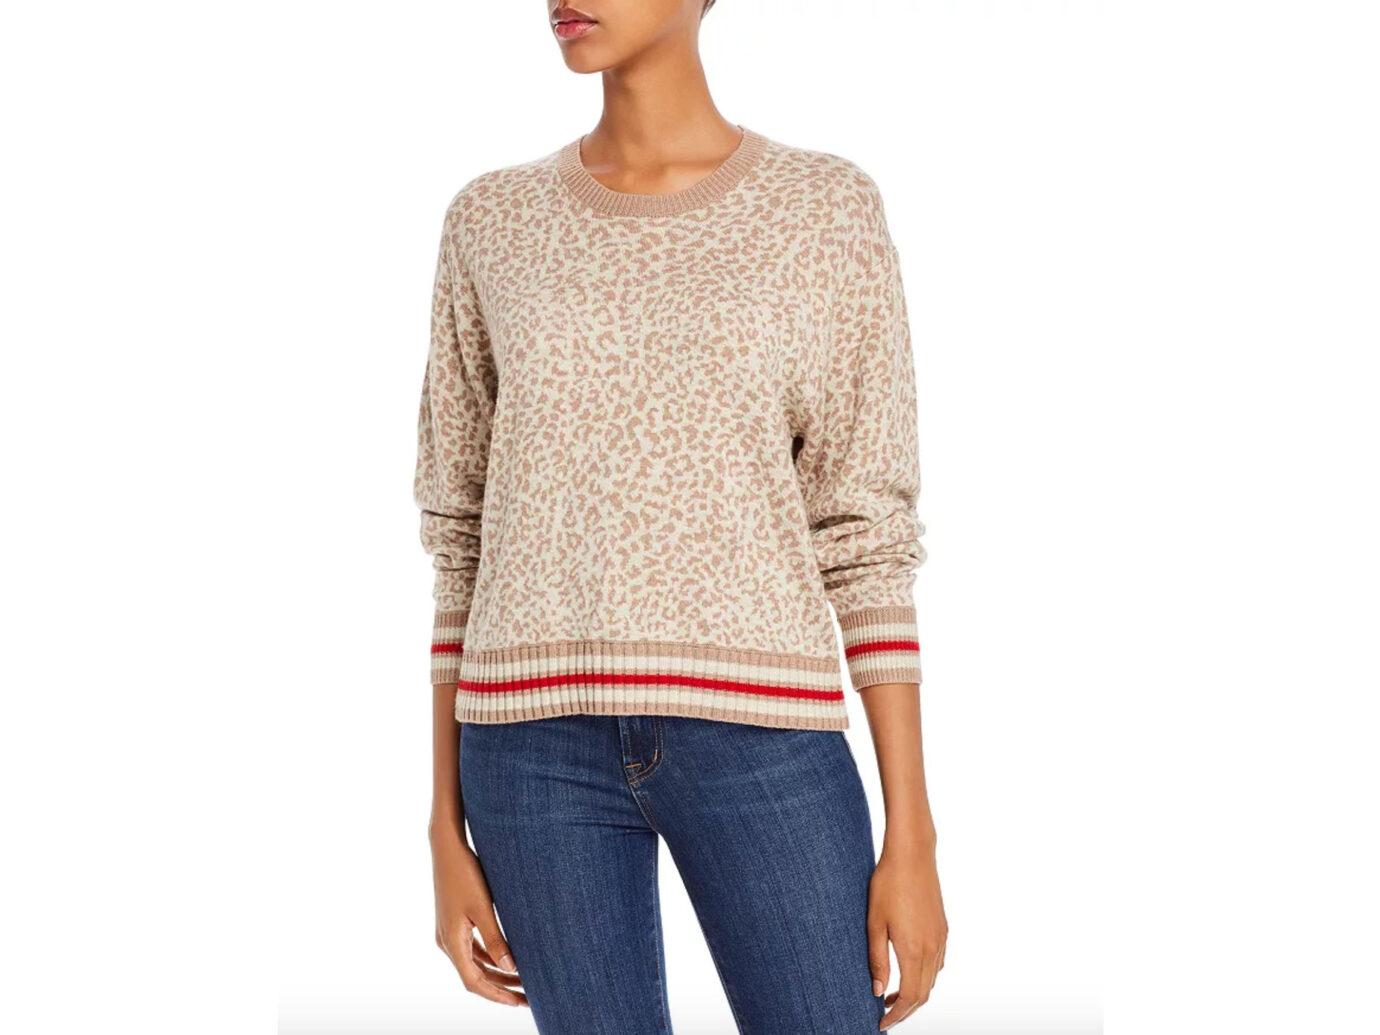 Splendid Leopard-Pattern Crewneck Sweater